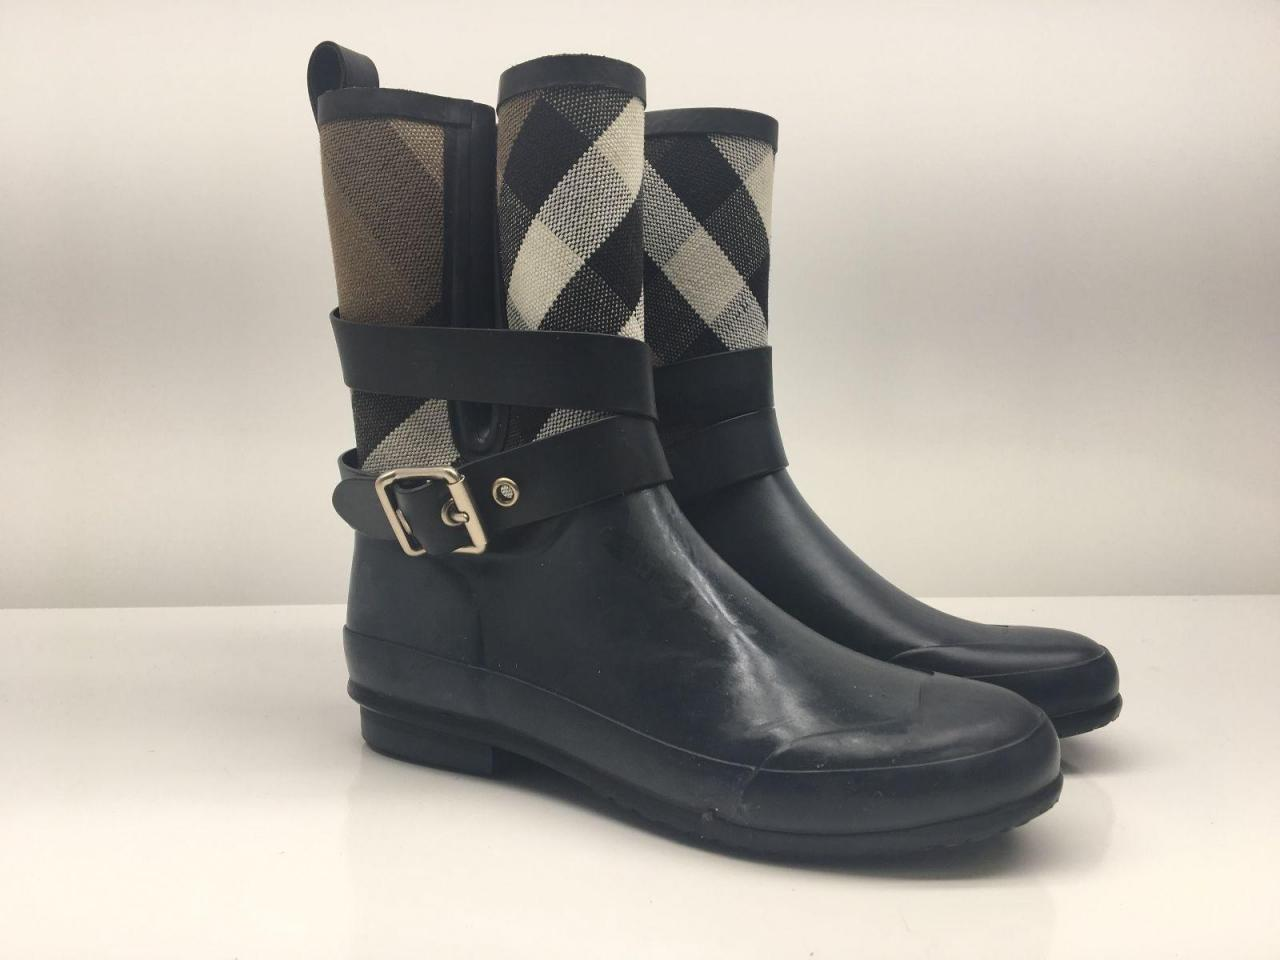 b84cb6a1e29 Burberry Black  holloway  Rain Boots Booties - Best Replica Shoes ...